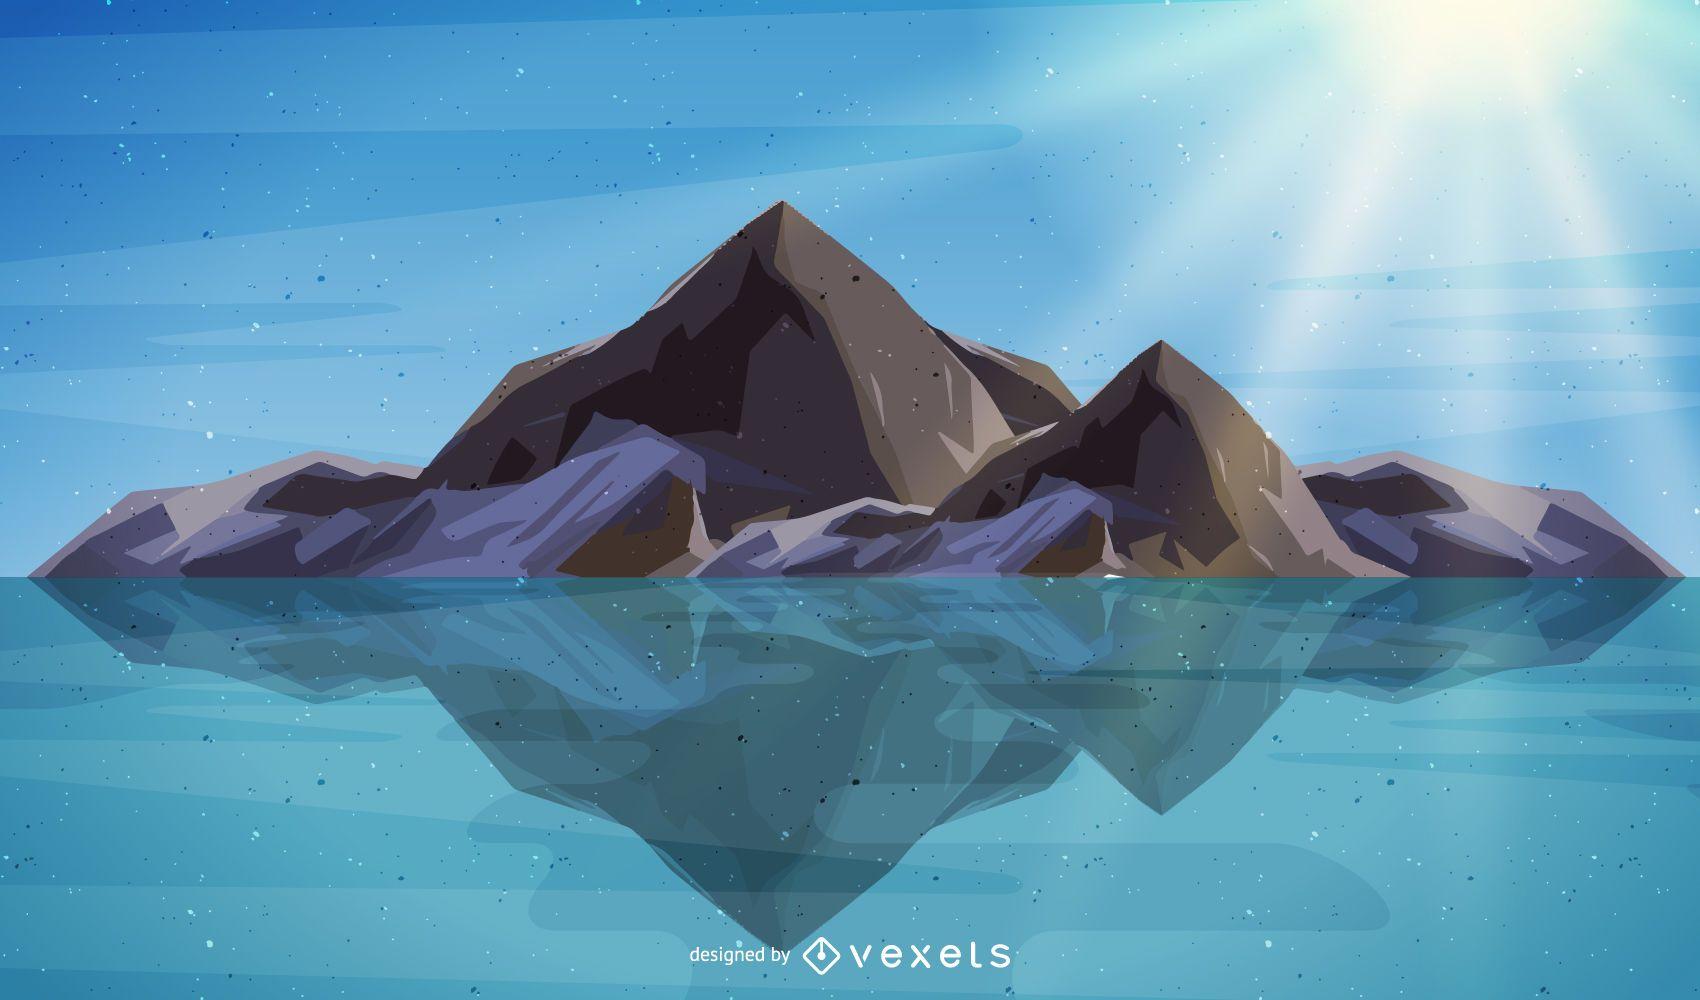 Mountain landscape illustration design vector download for Mountain landscape design